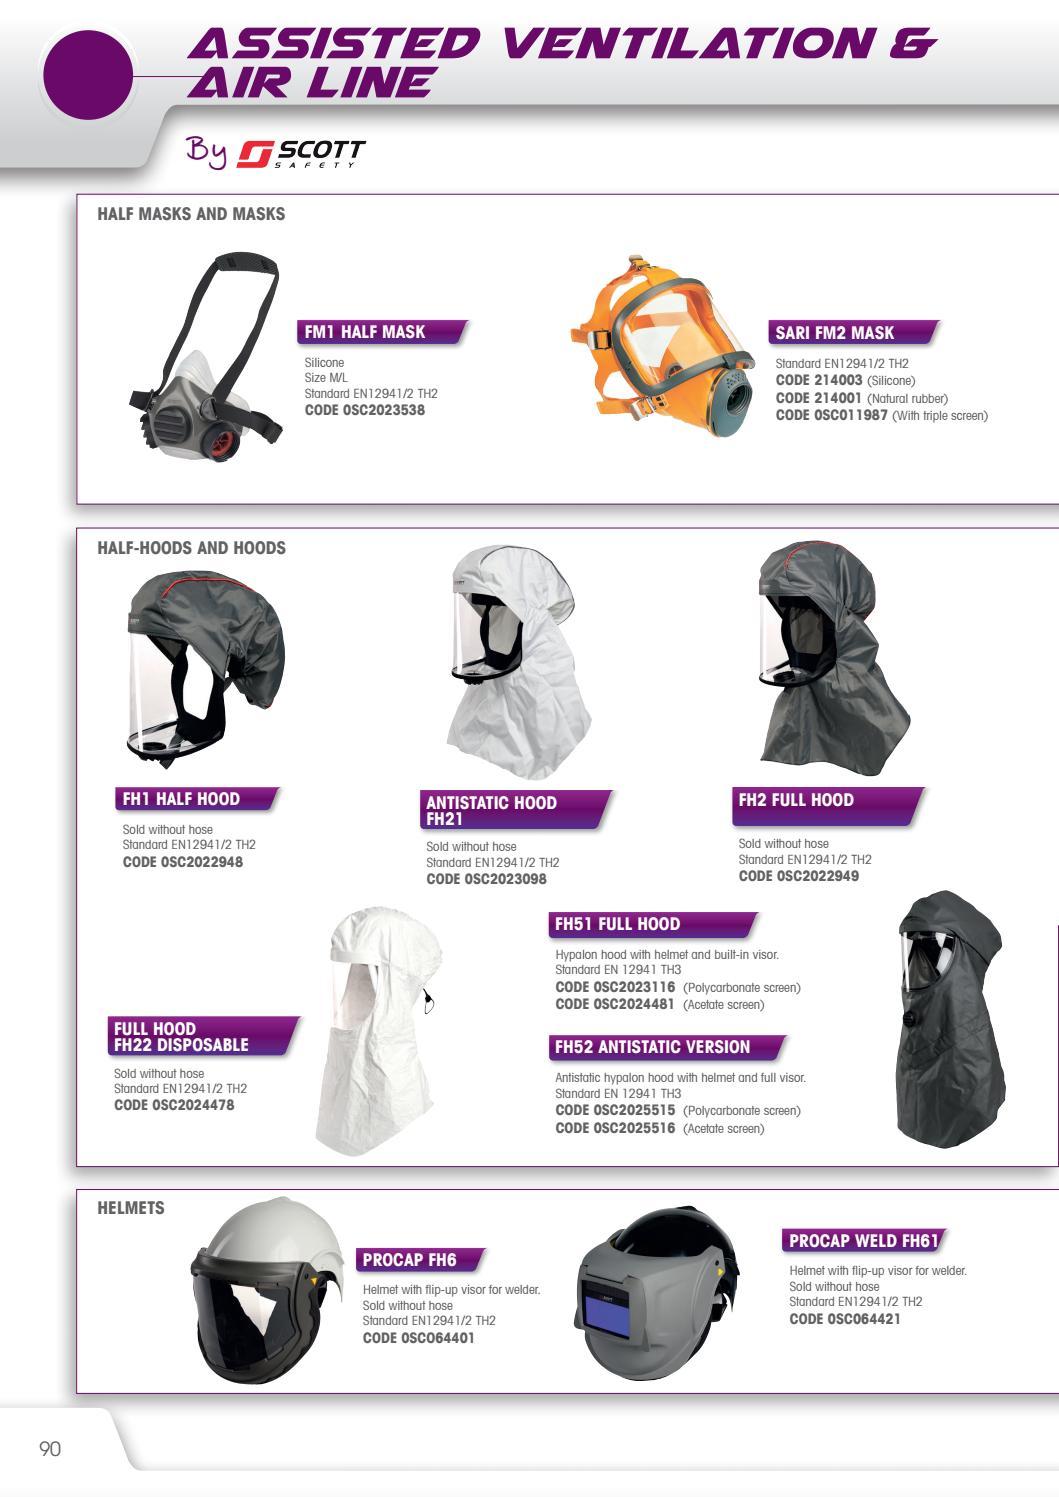 for Vapors Dust Painting Spray Welding Industrial Accessories Full Face R/êsp/îr/àt/õr Seal Protection Double Air Filter Mātsk